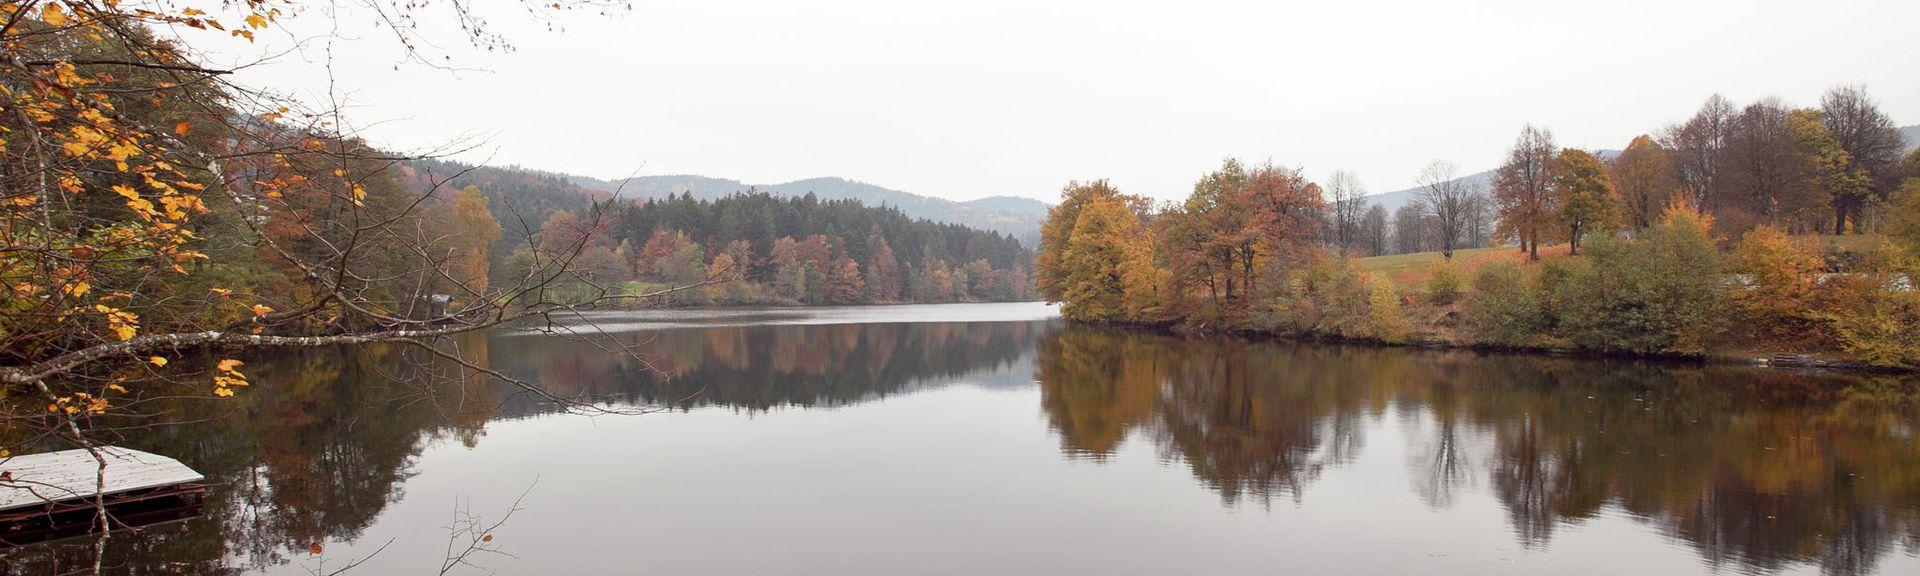 Neukirchen vorm Wald, Germany